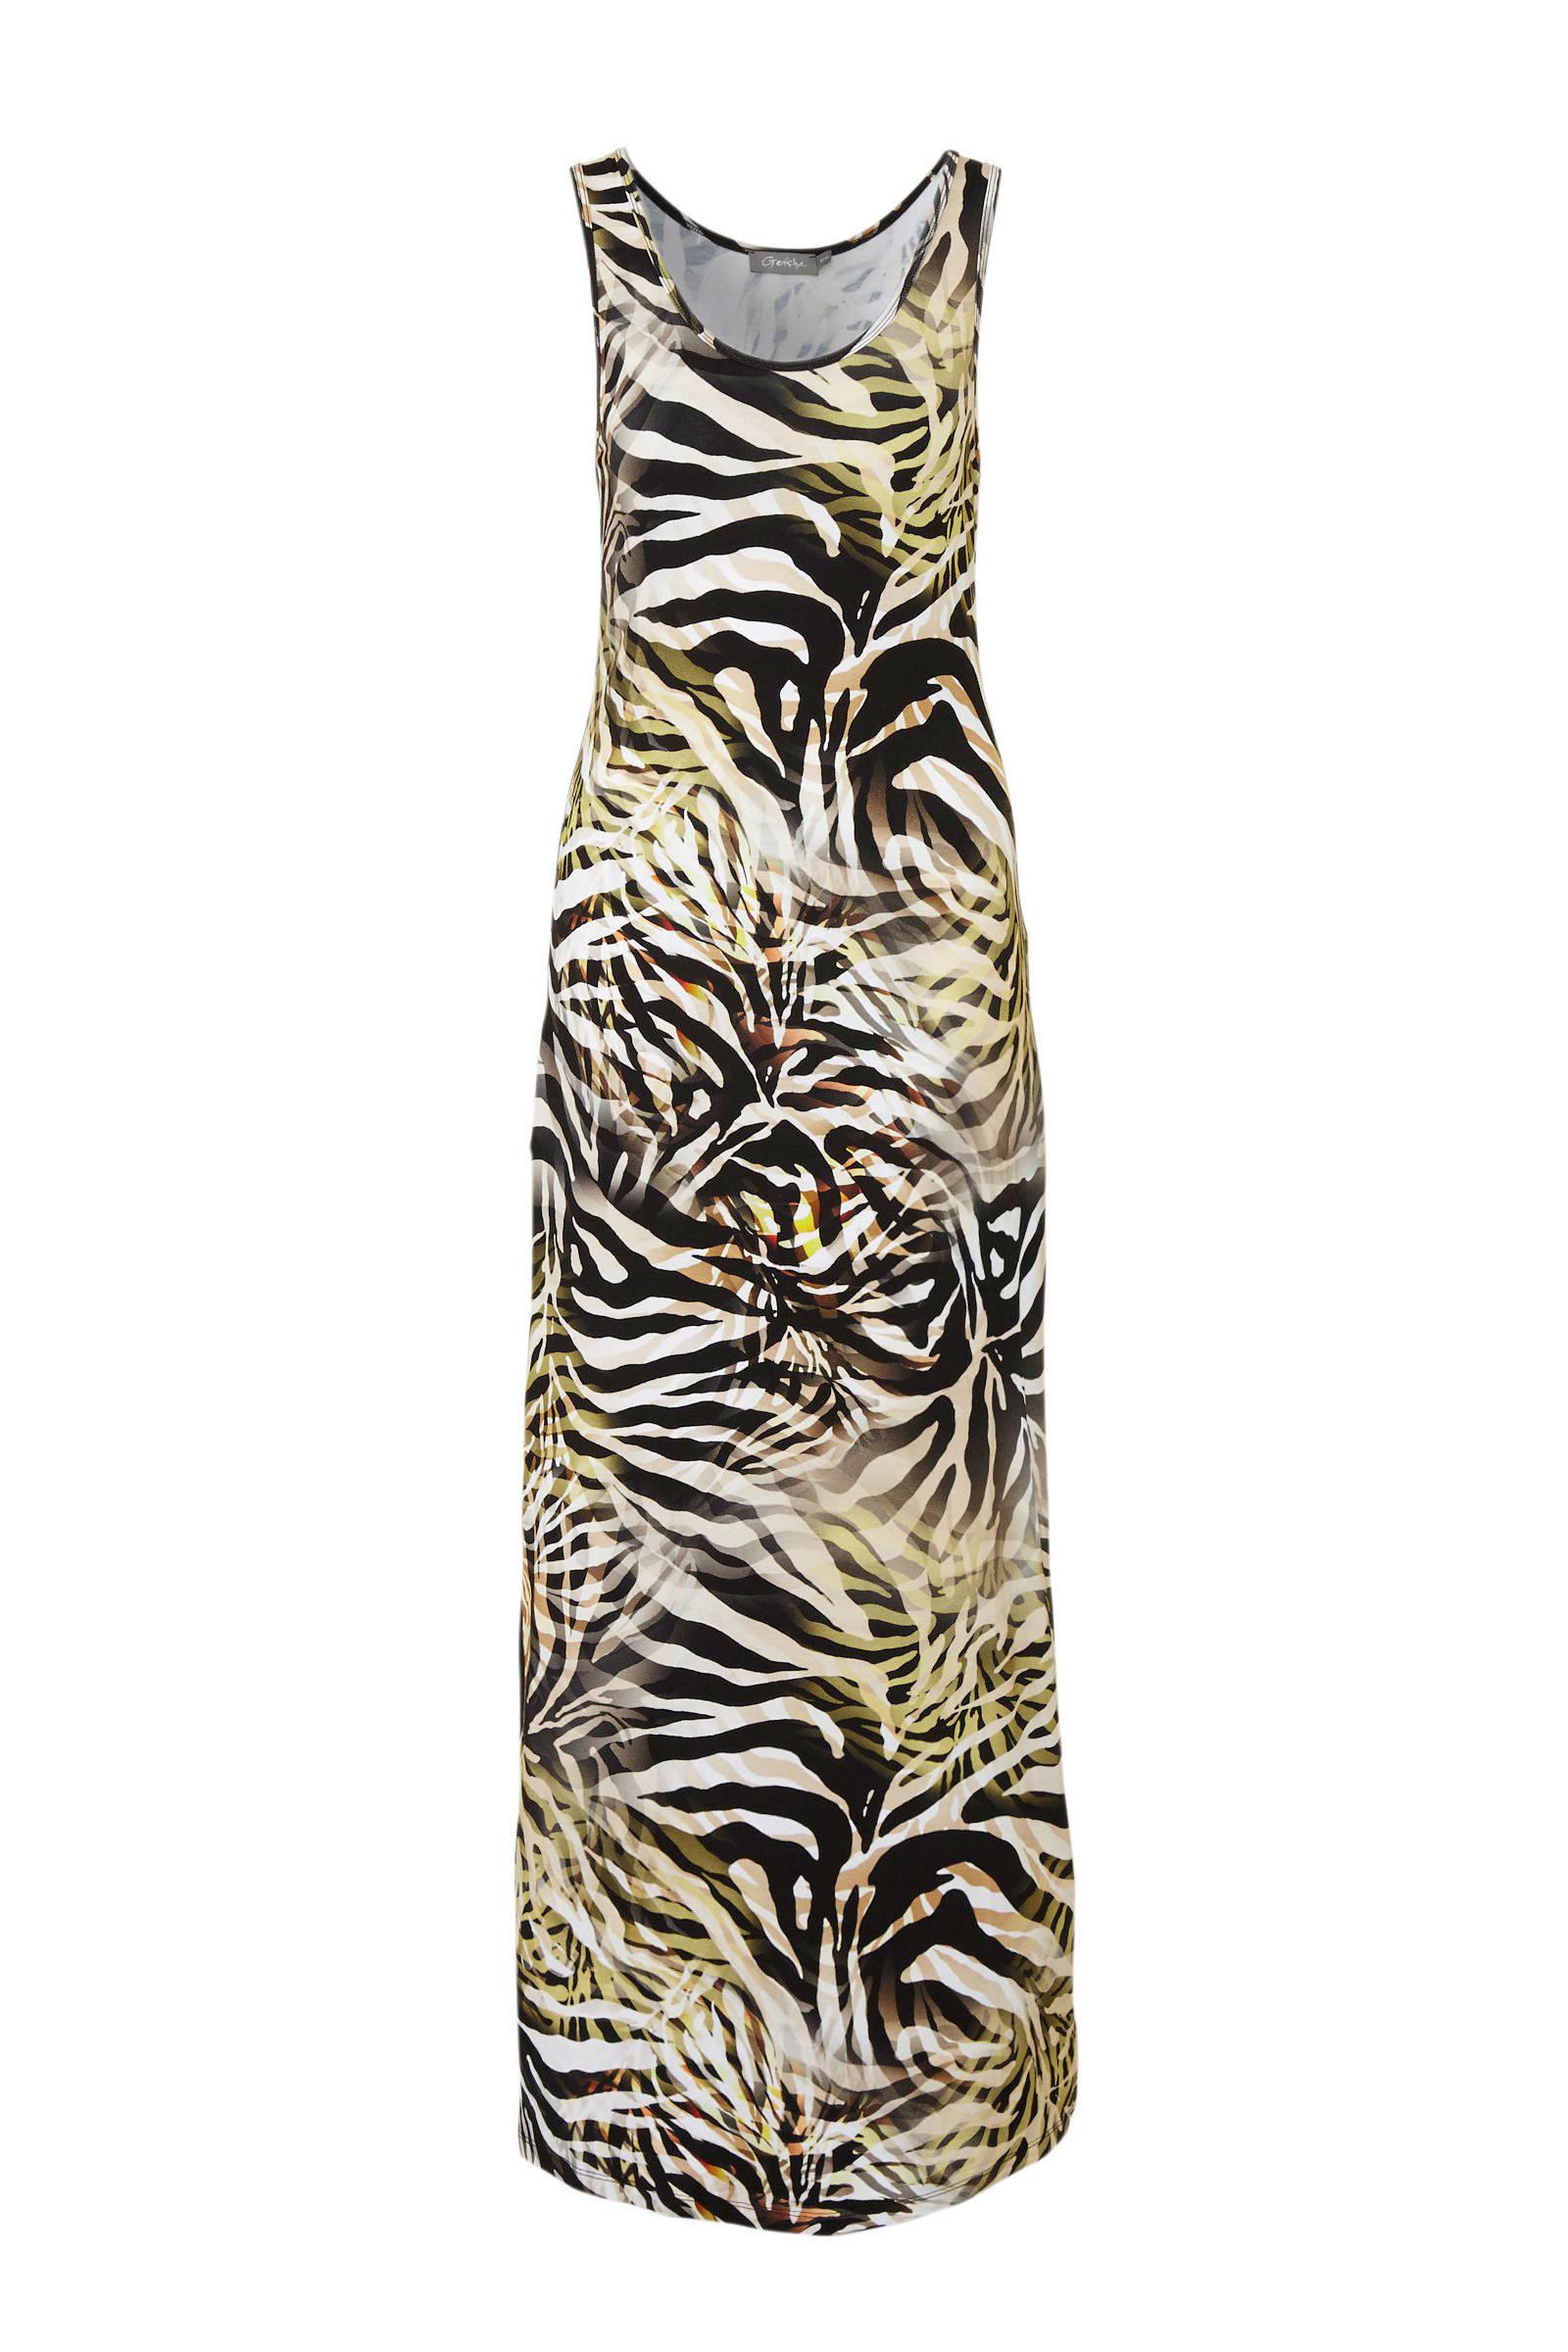 jersey maxi jurk met zebraprint bruinzwartgroen